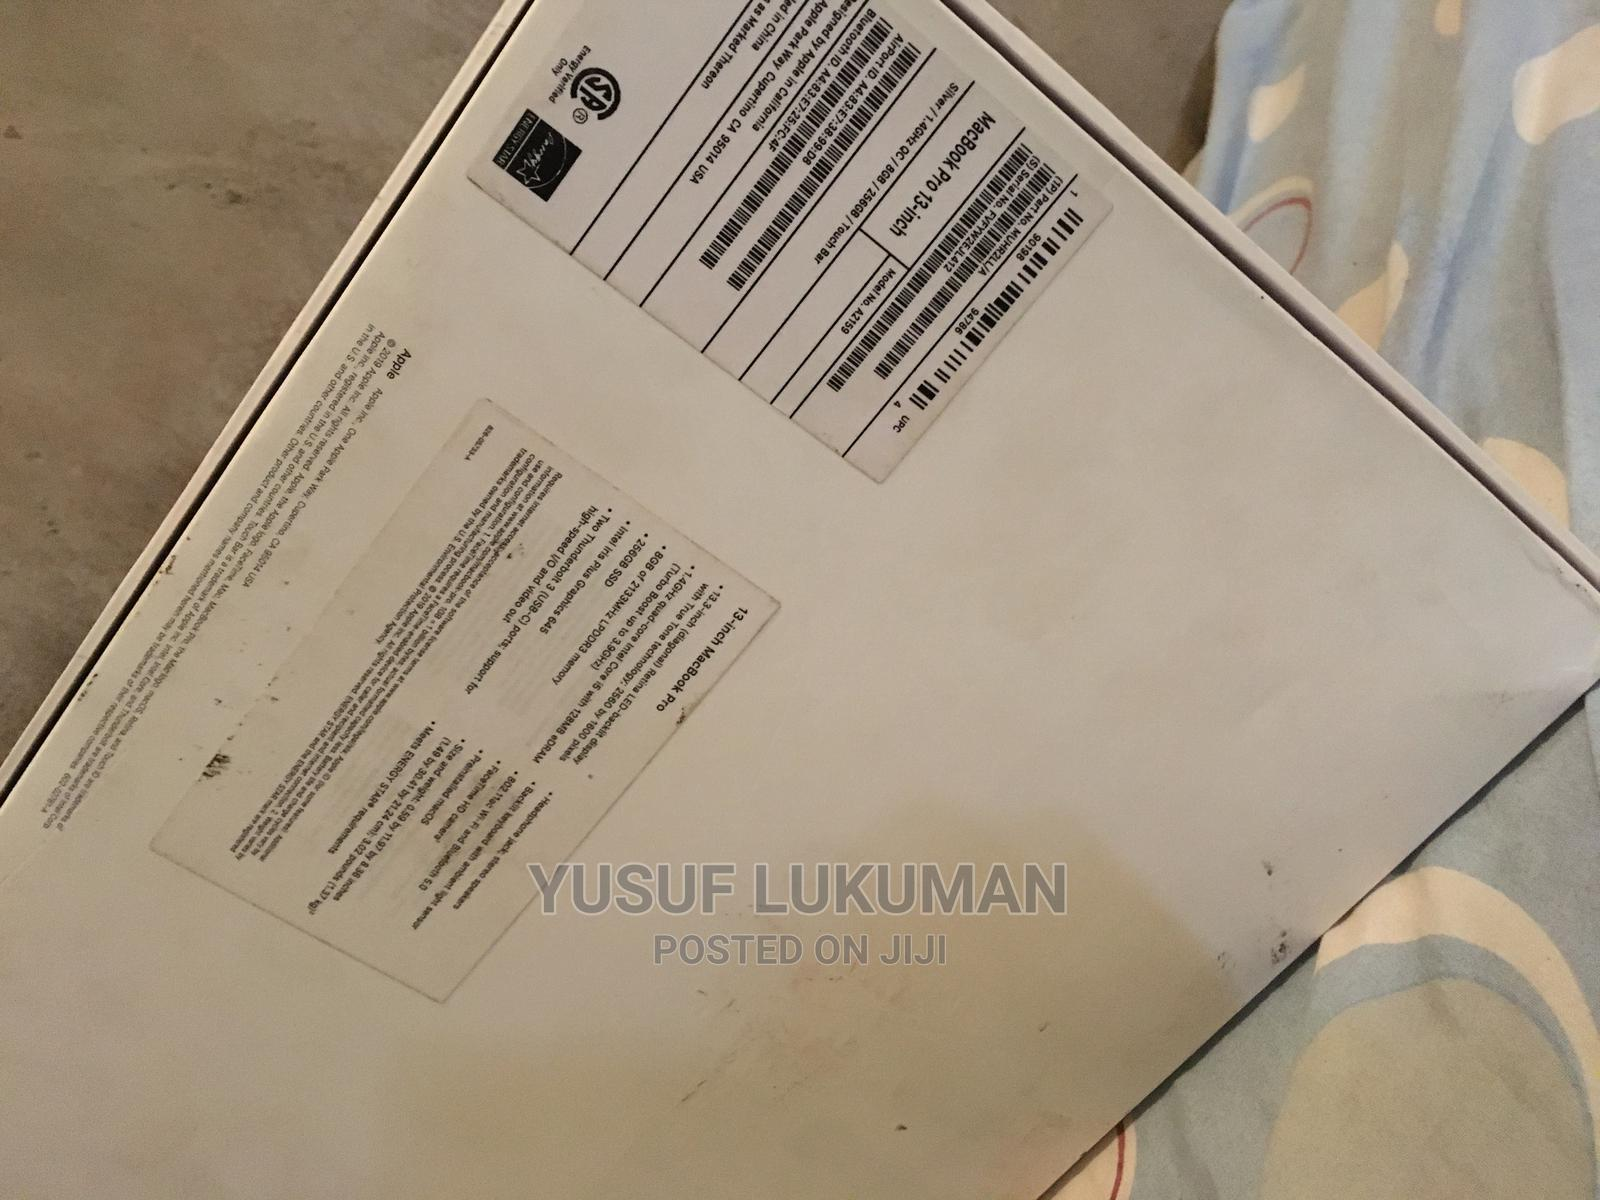 New Laptop Apple MacBook Pro 2020 8GB Intel Core I5 SSD 256GB   Laptops & Computers for sale in Ilorin West, Kwara State, Nigeria